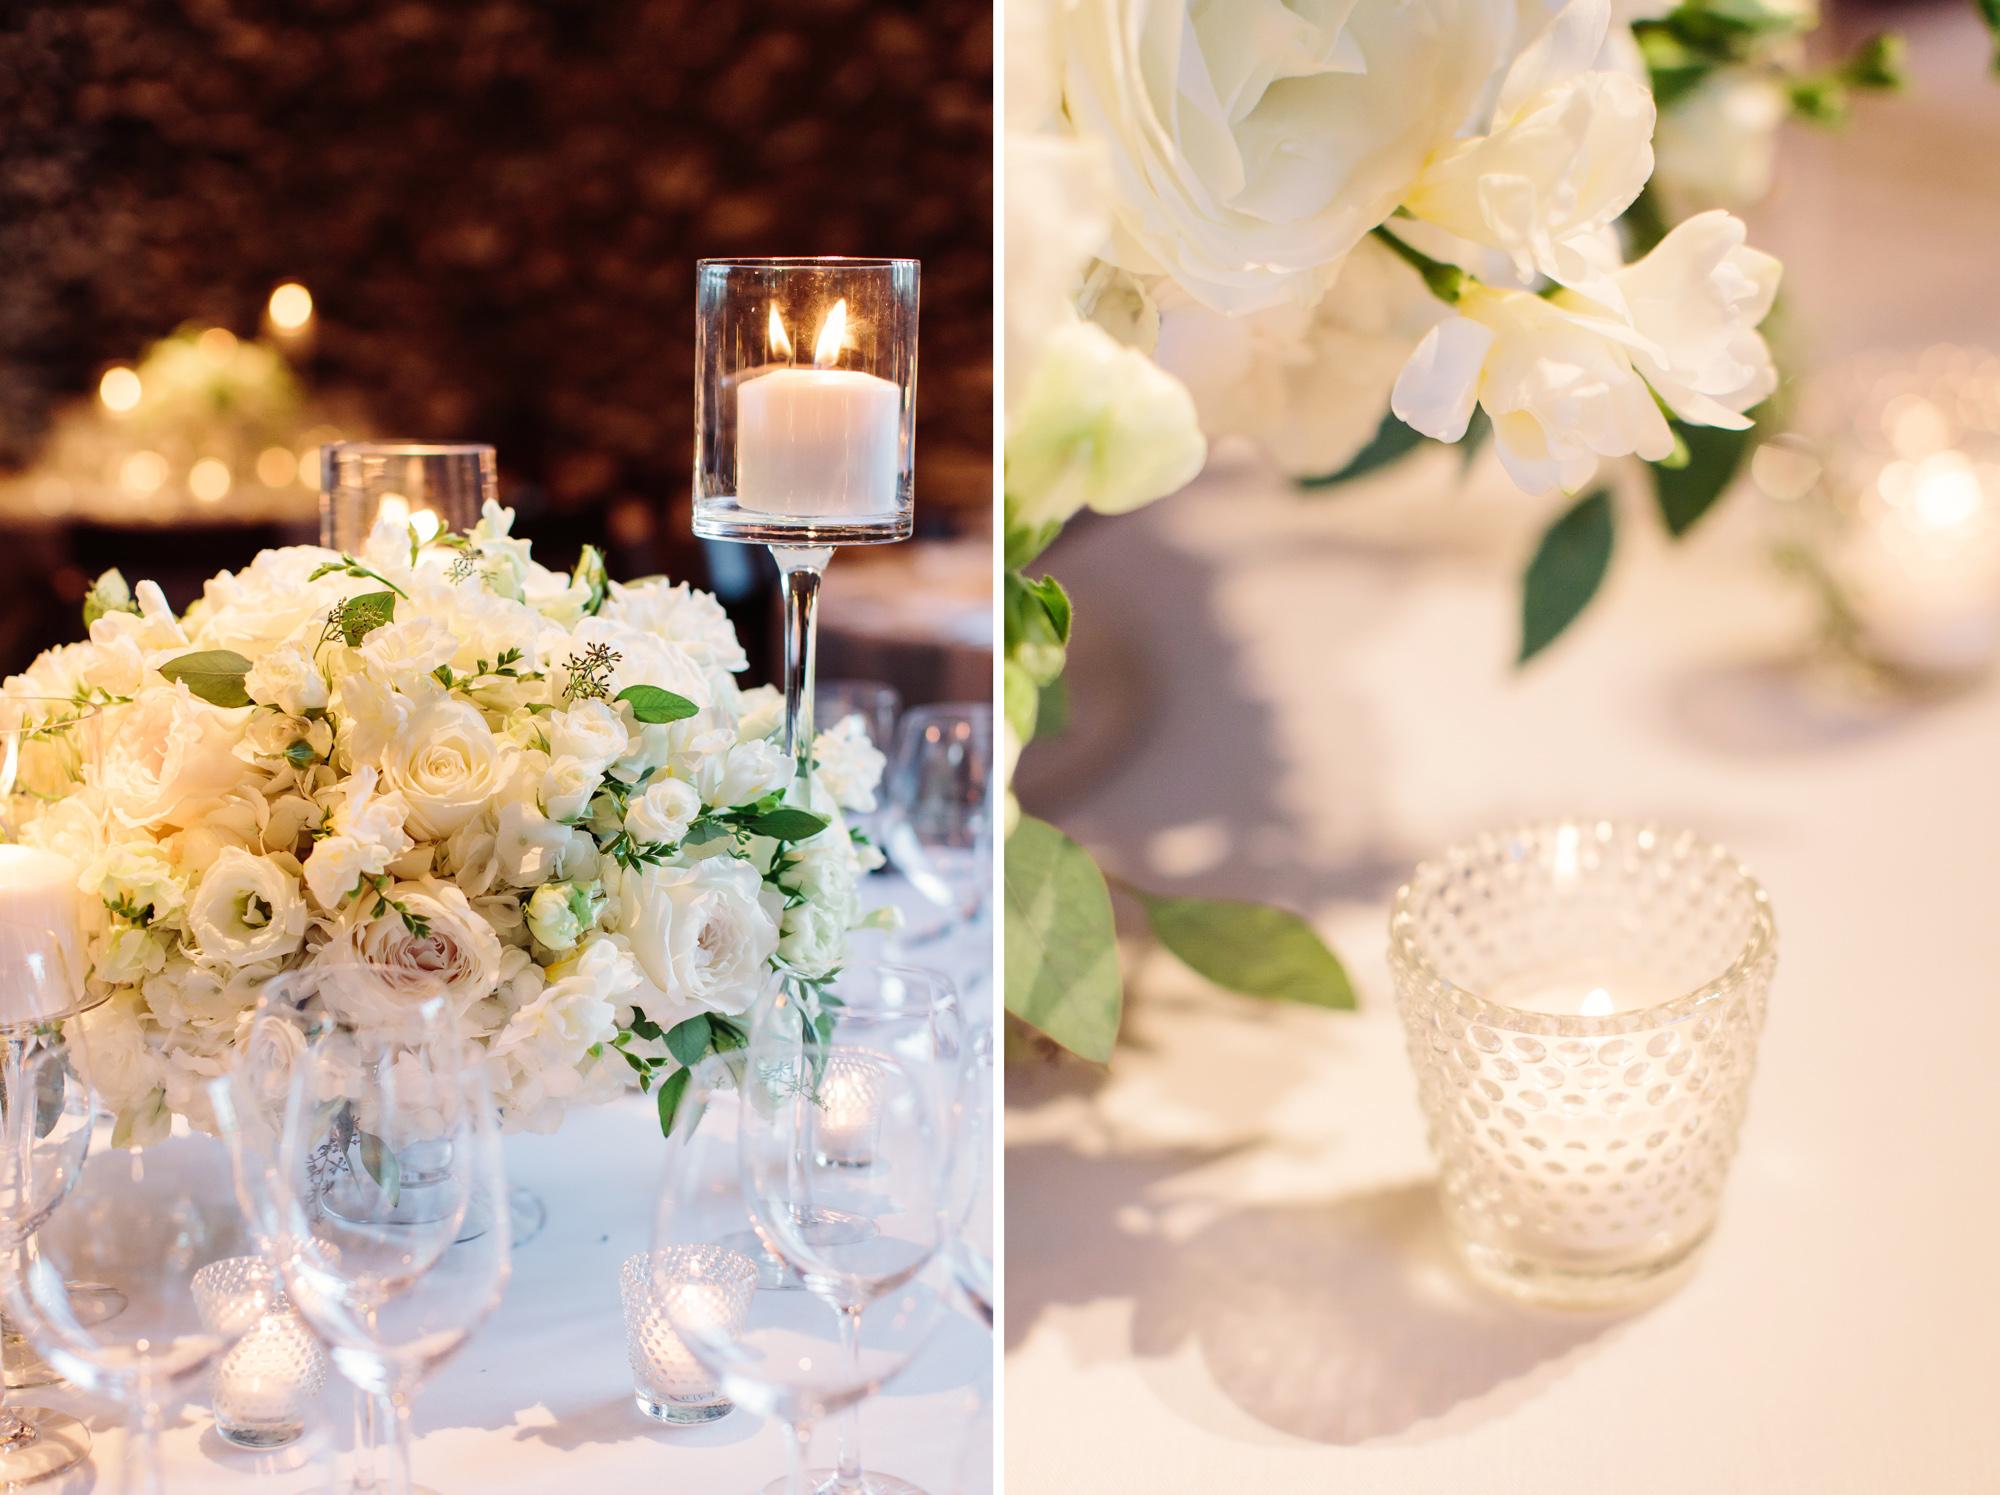 54_Jessica_Ted_Blue_Hill_Stone_Barns_Wedding_Pocantico_NY_Tanya_Salazar_Photography.jpg